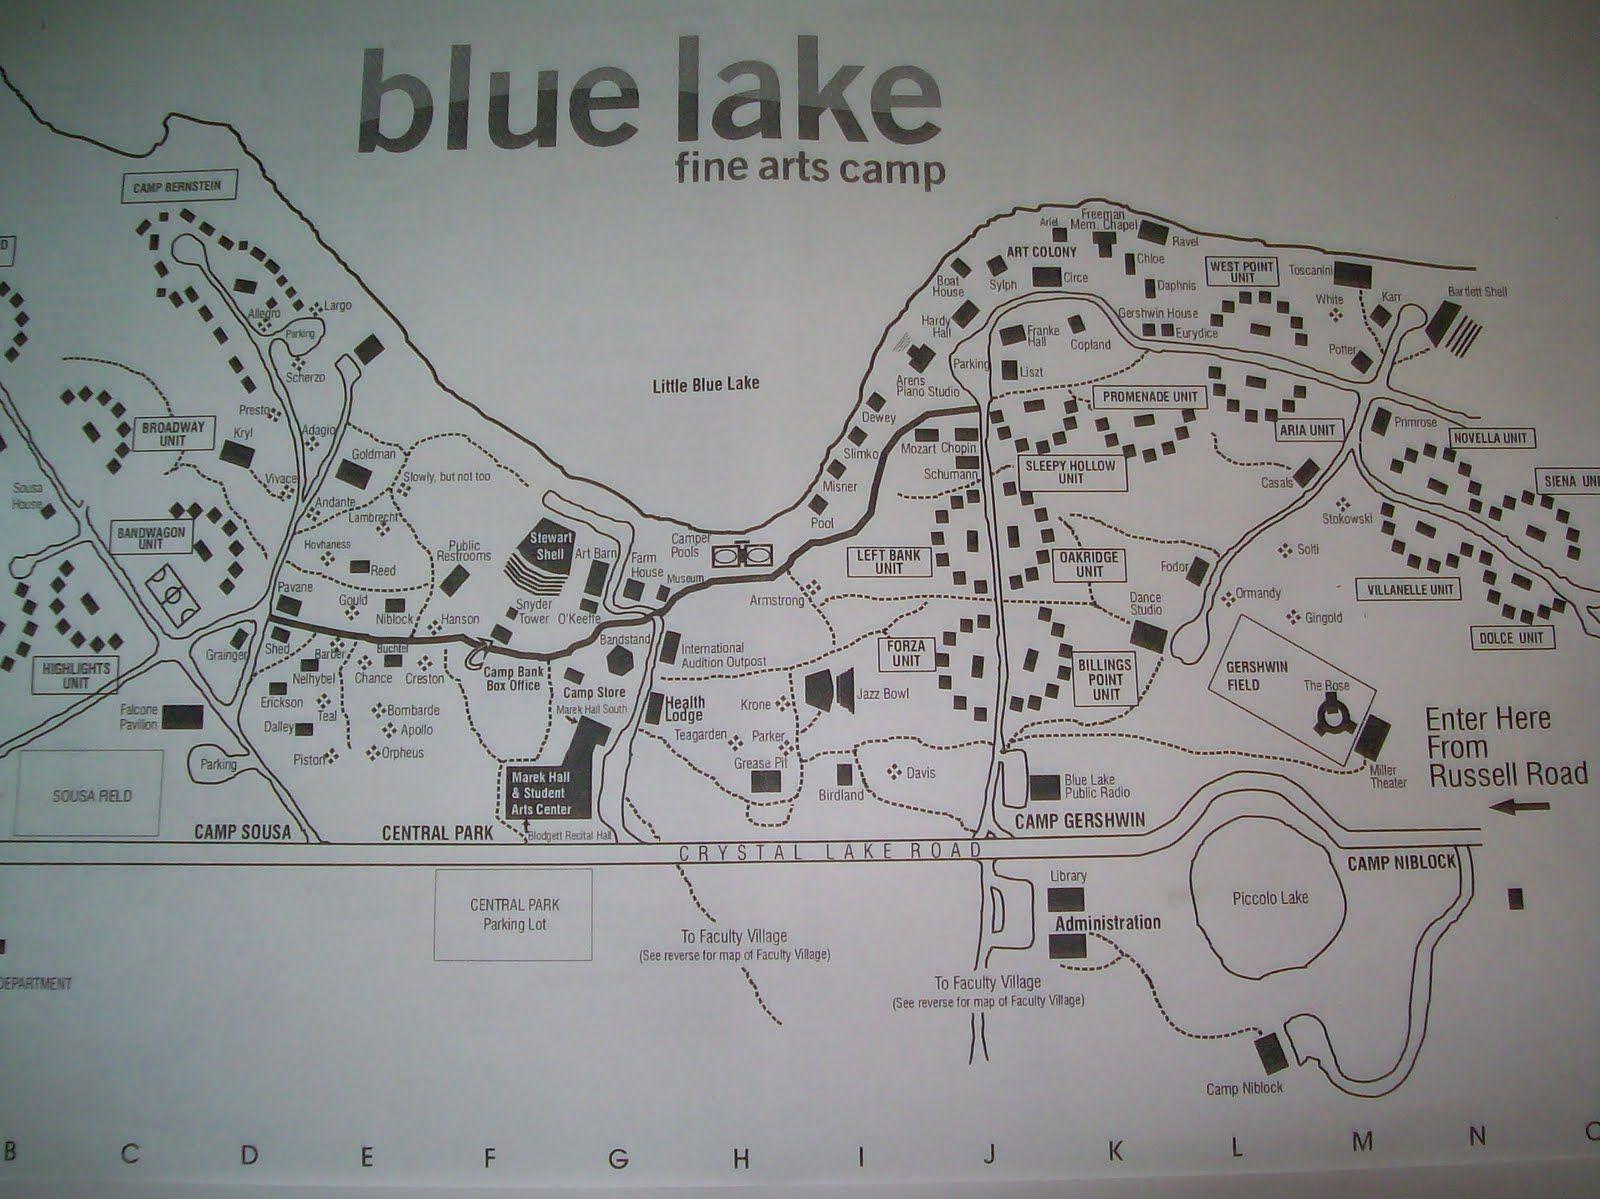 Blue Lake Fine Arts Camp Map | Global Map